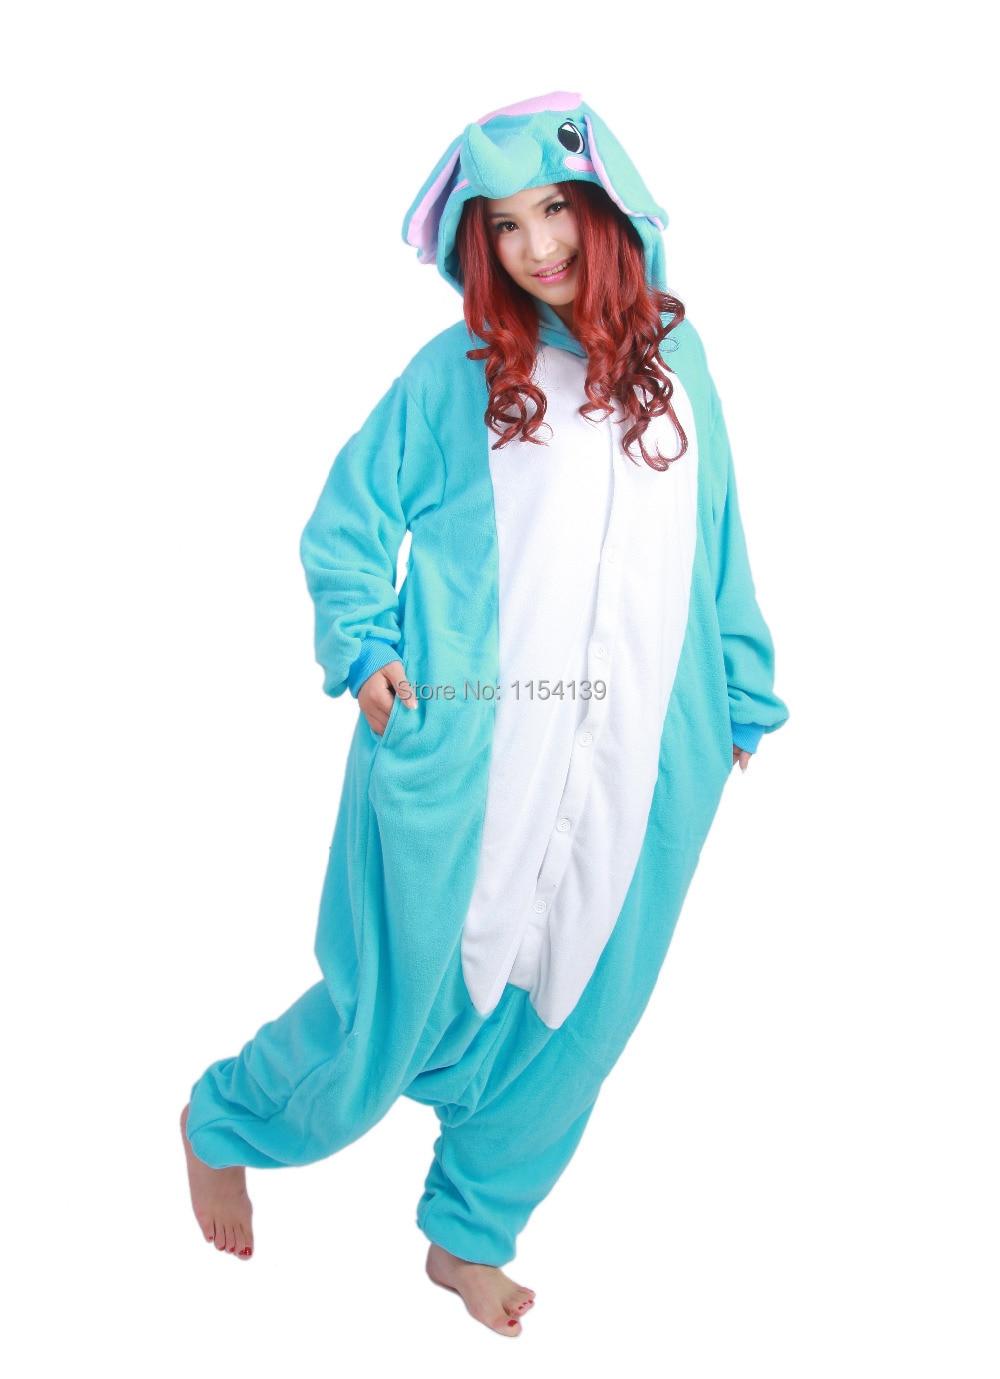 32522b1128bd Free shipping Elephants animal onesies 2014 new cheap Animal Onesies  Elephants pajamas Christmas Party animal Costume Sleepwear